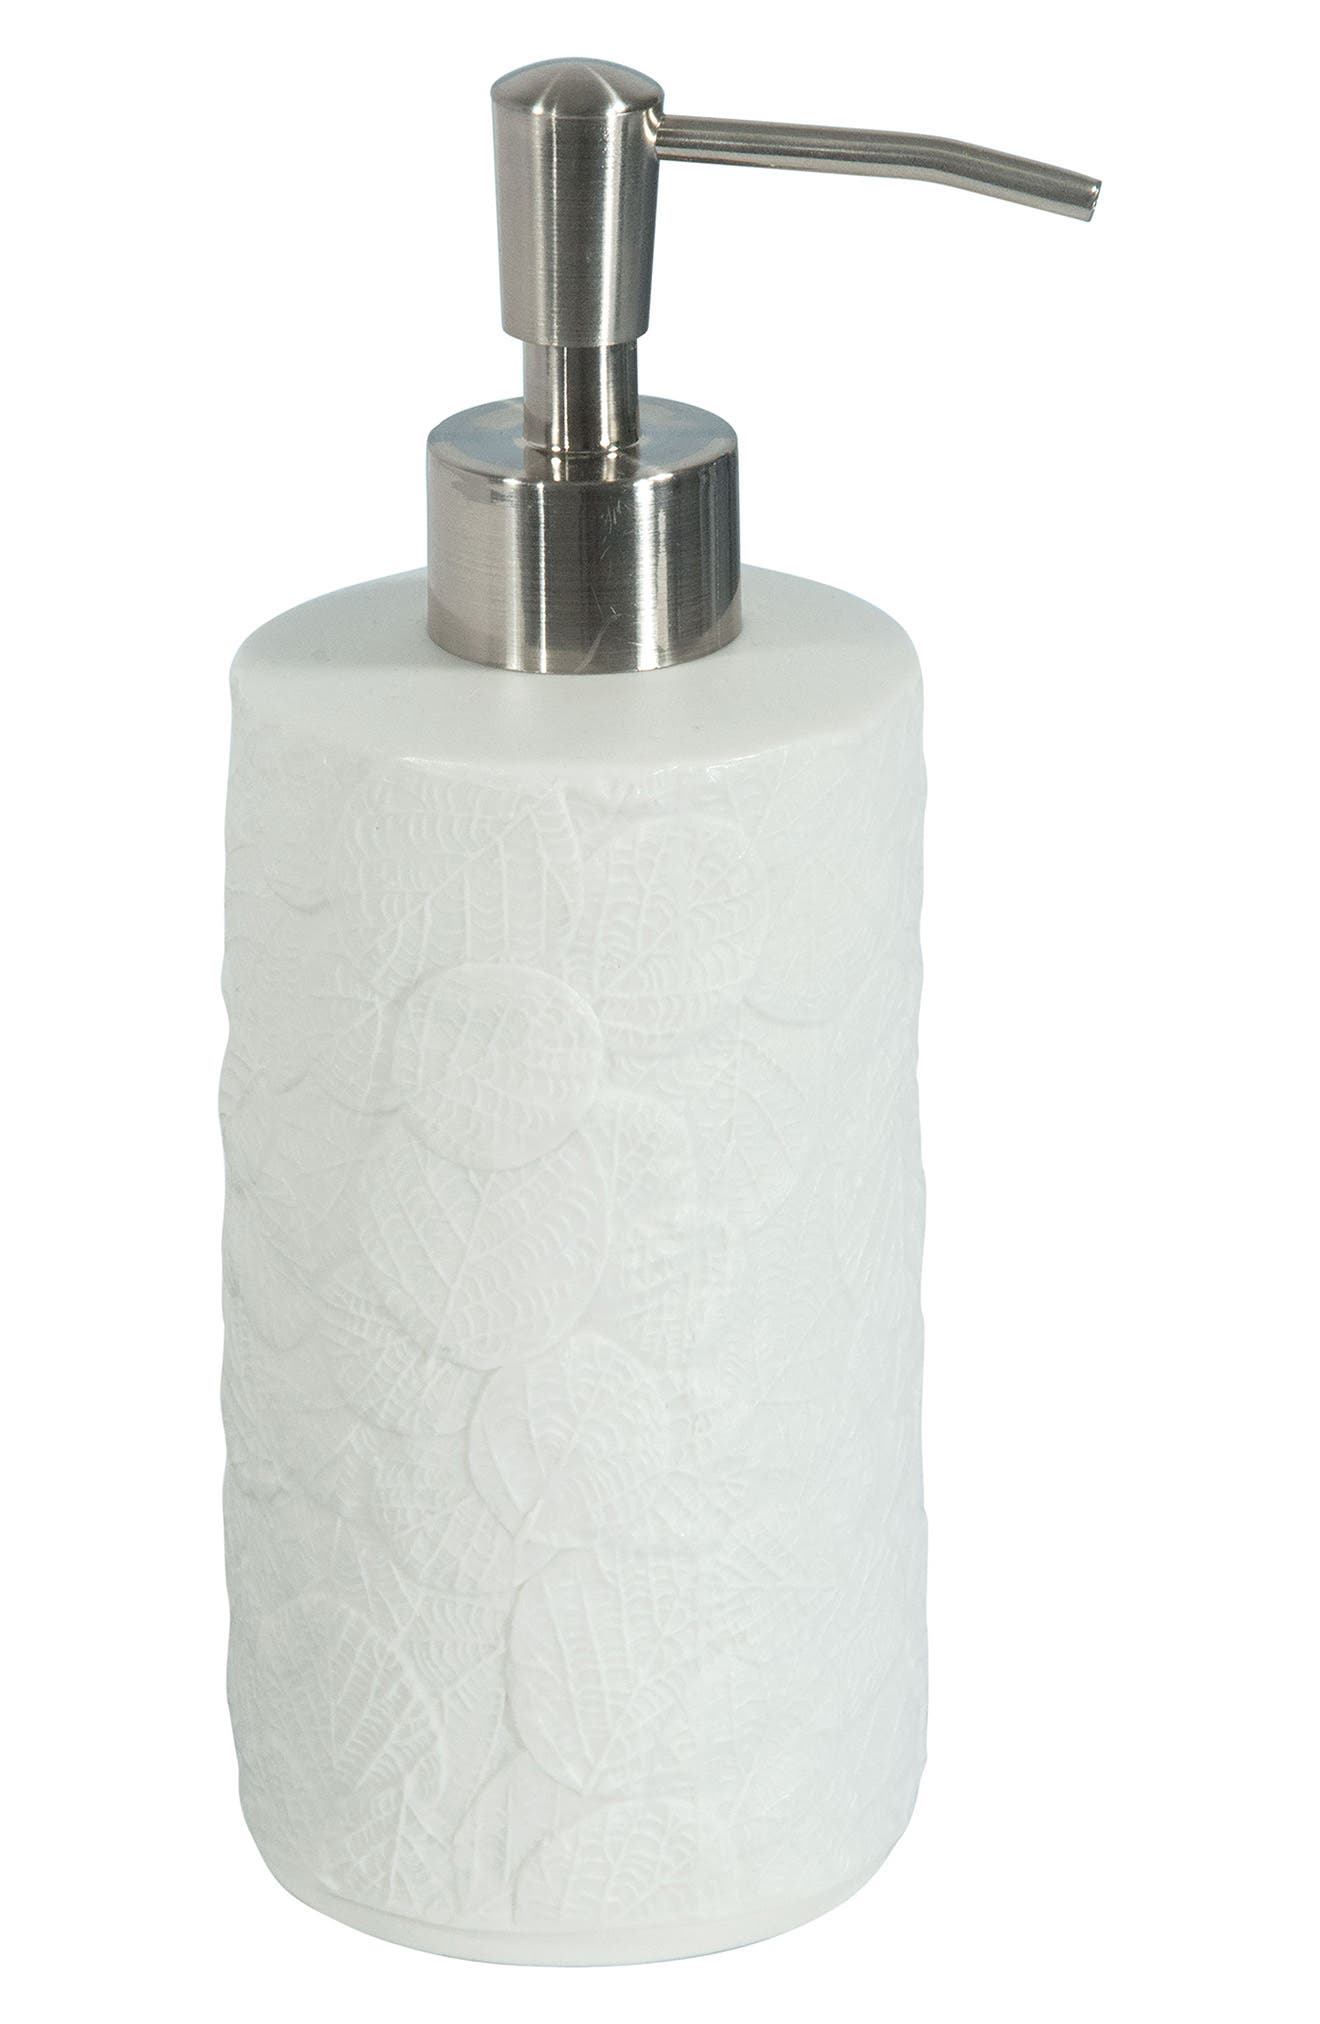 Botanical Leaf Porcelain Lotion Dispenser,                             Main thumbnail 1, color,                             WHITE